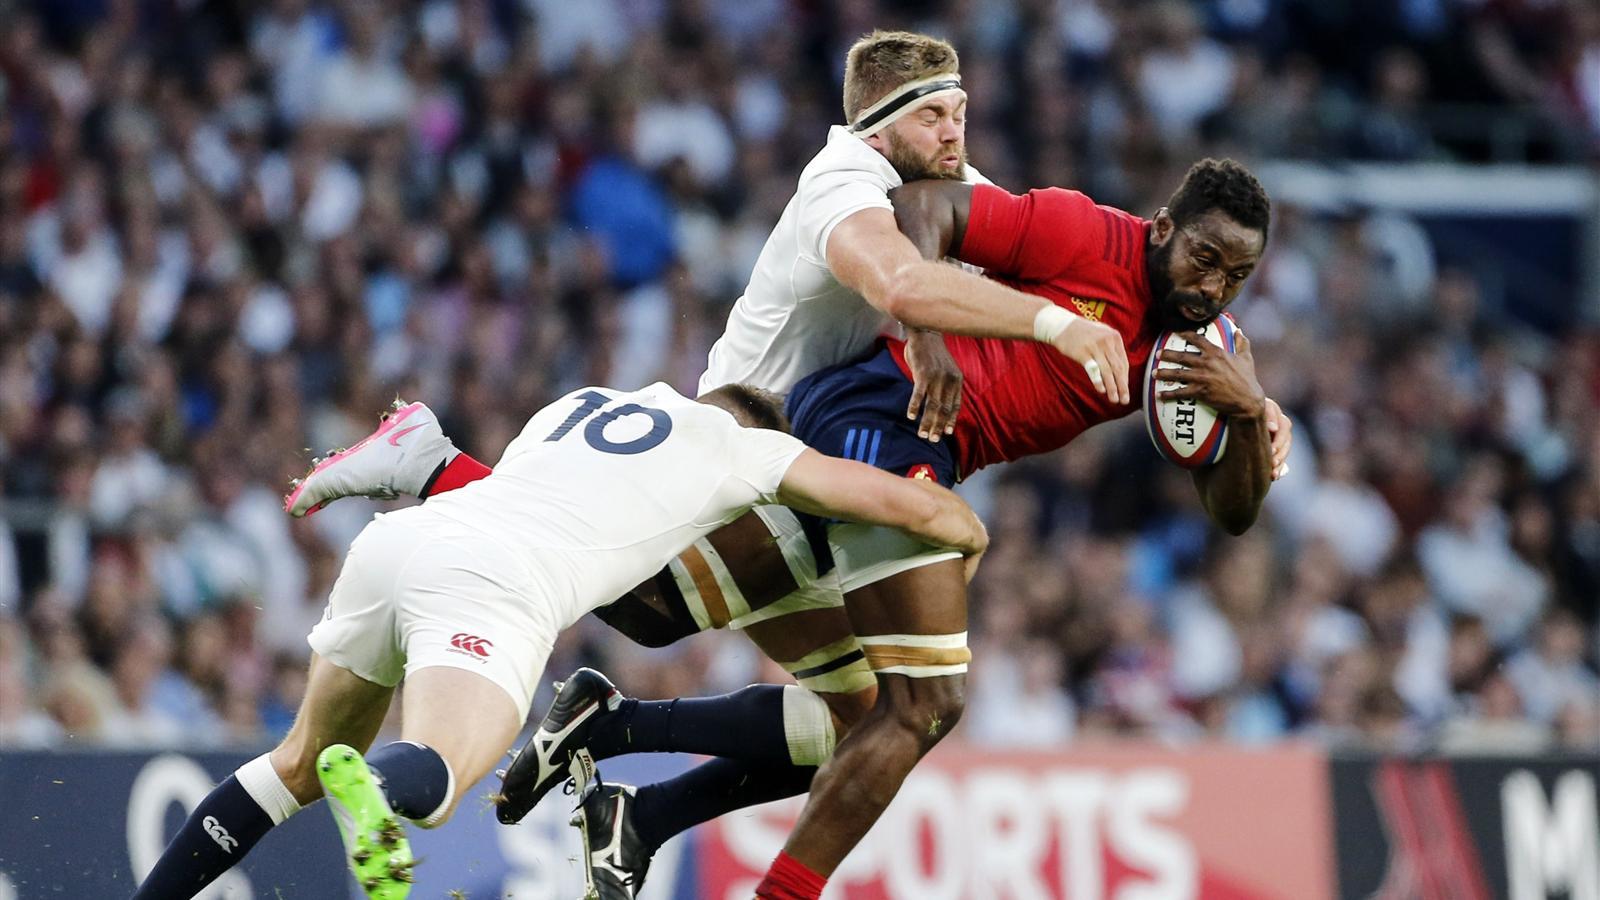 Fulgence Ouedraogo (XV de France) face à l'Angleterre - 15 août 2015